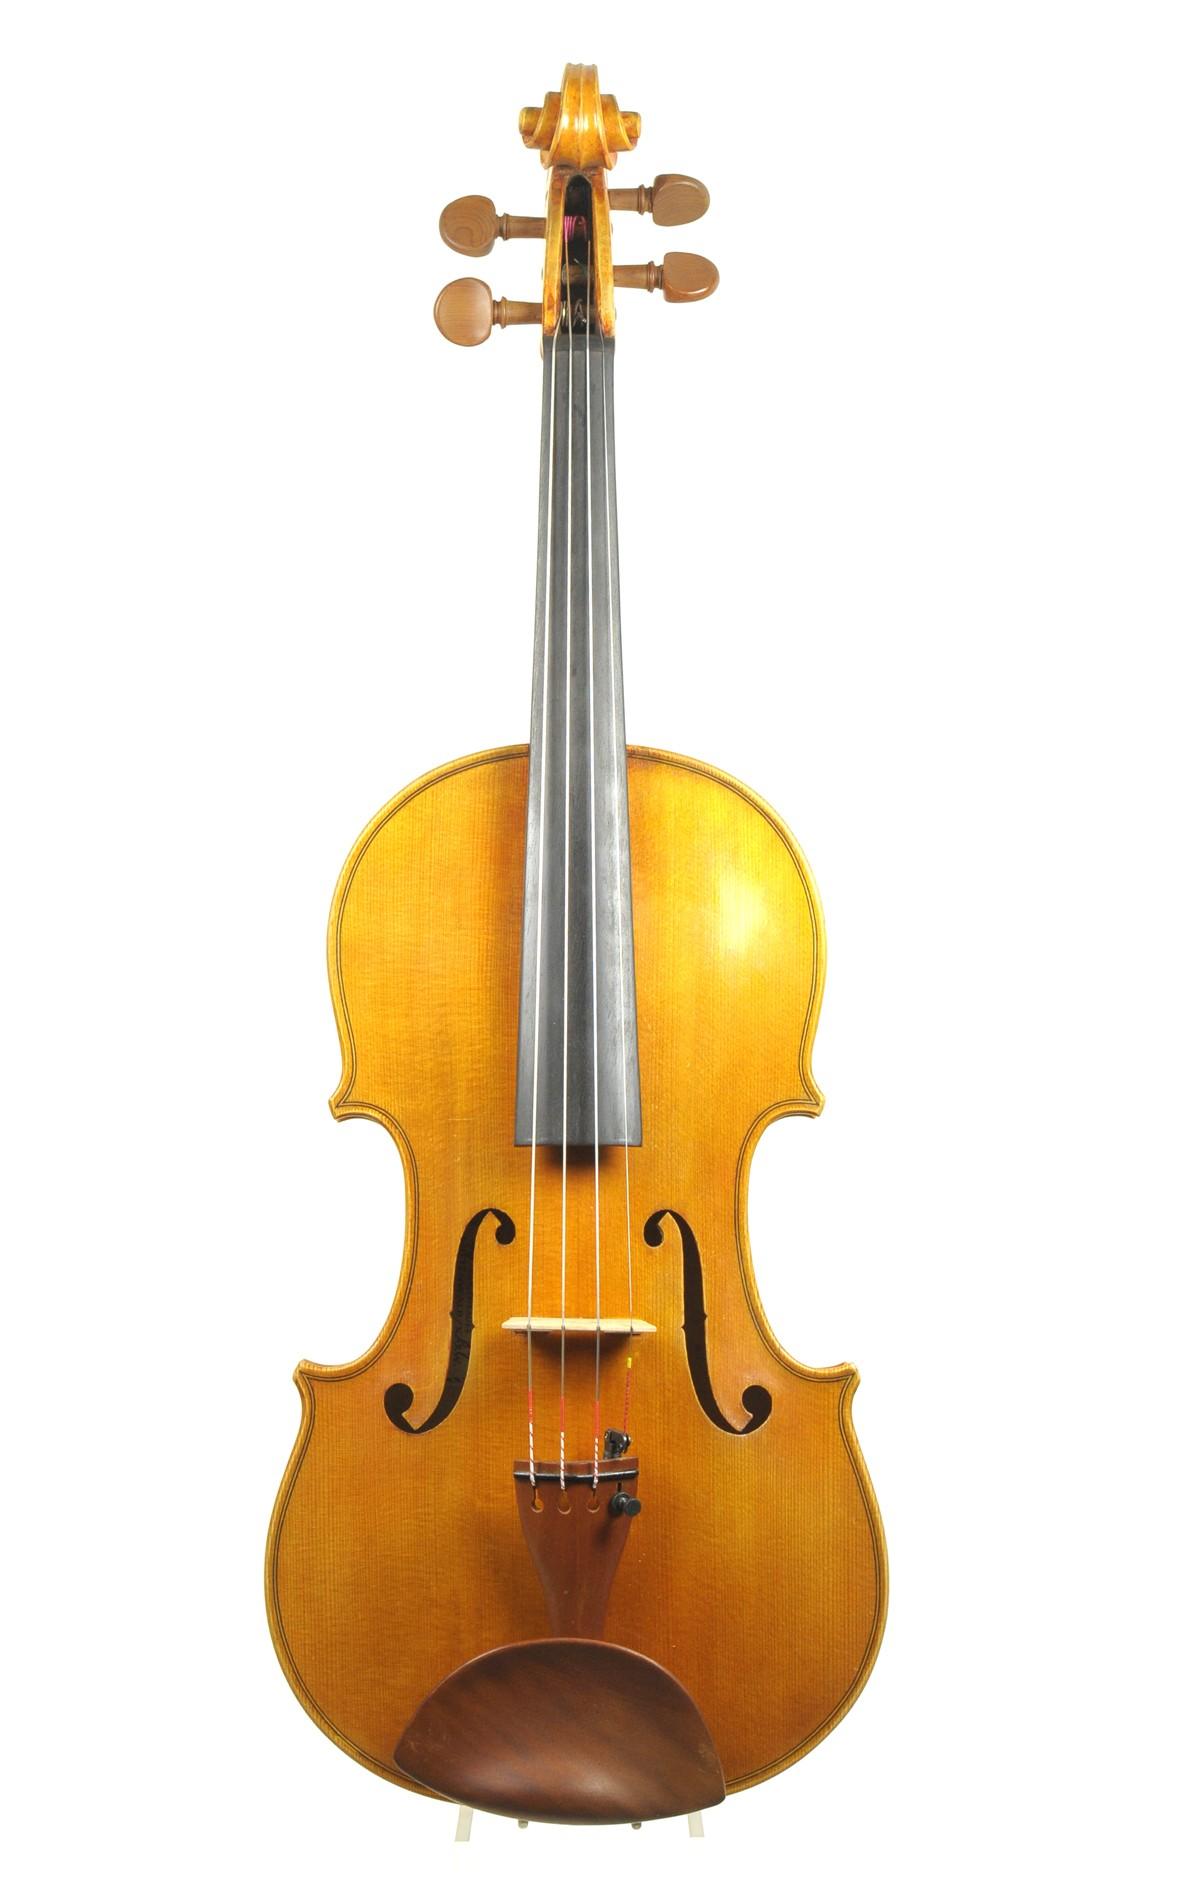 Mittenwald violin by Matthias Klotz 1981 - table